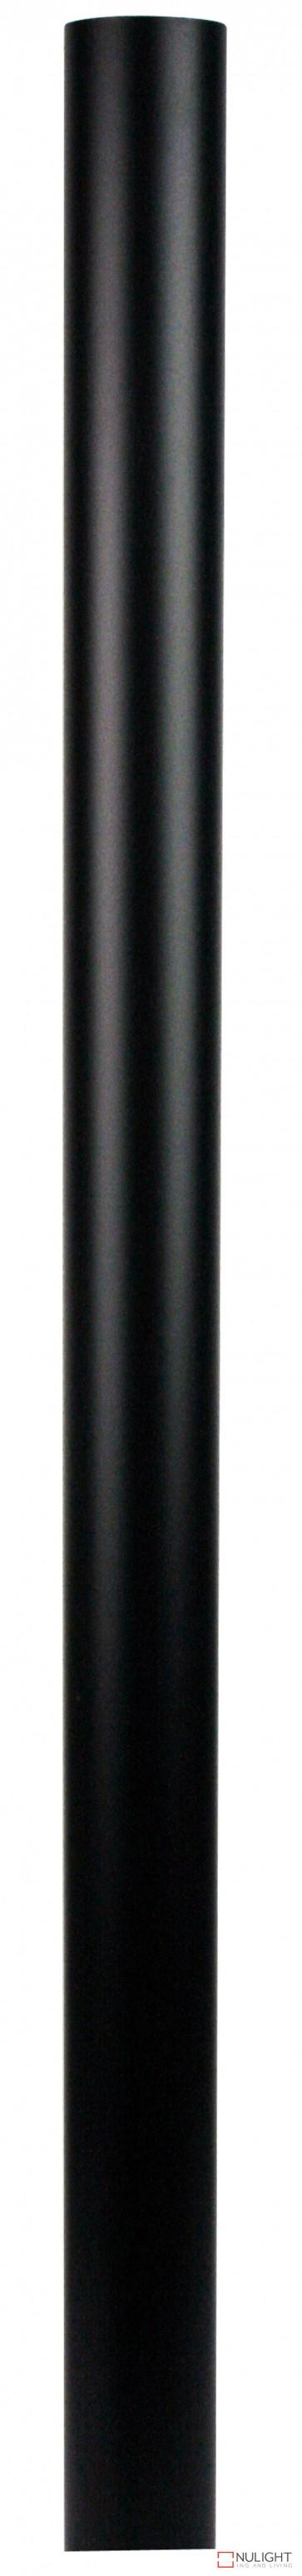 Plumb 60Mm Post Only H2400Mm Black ORI